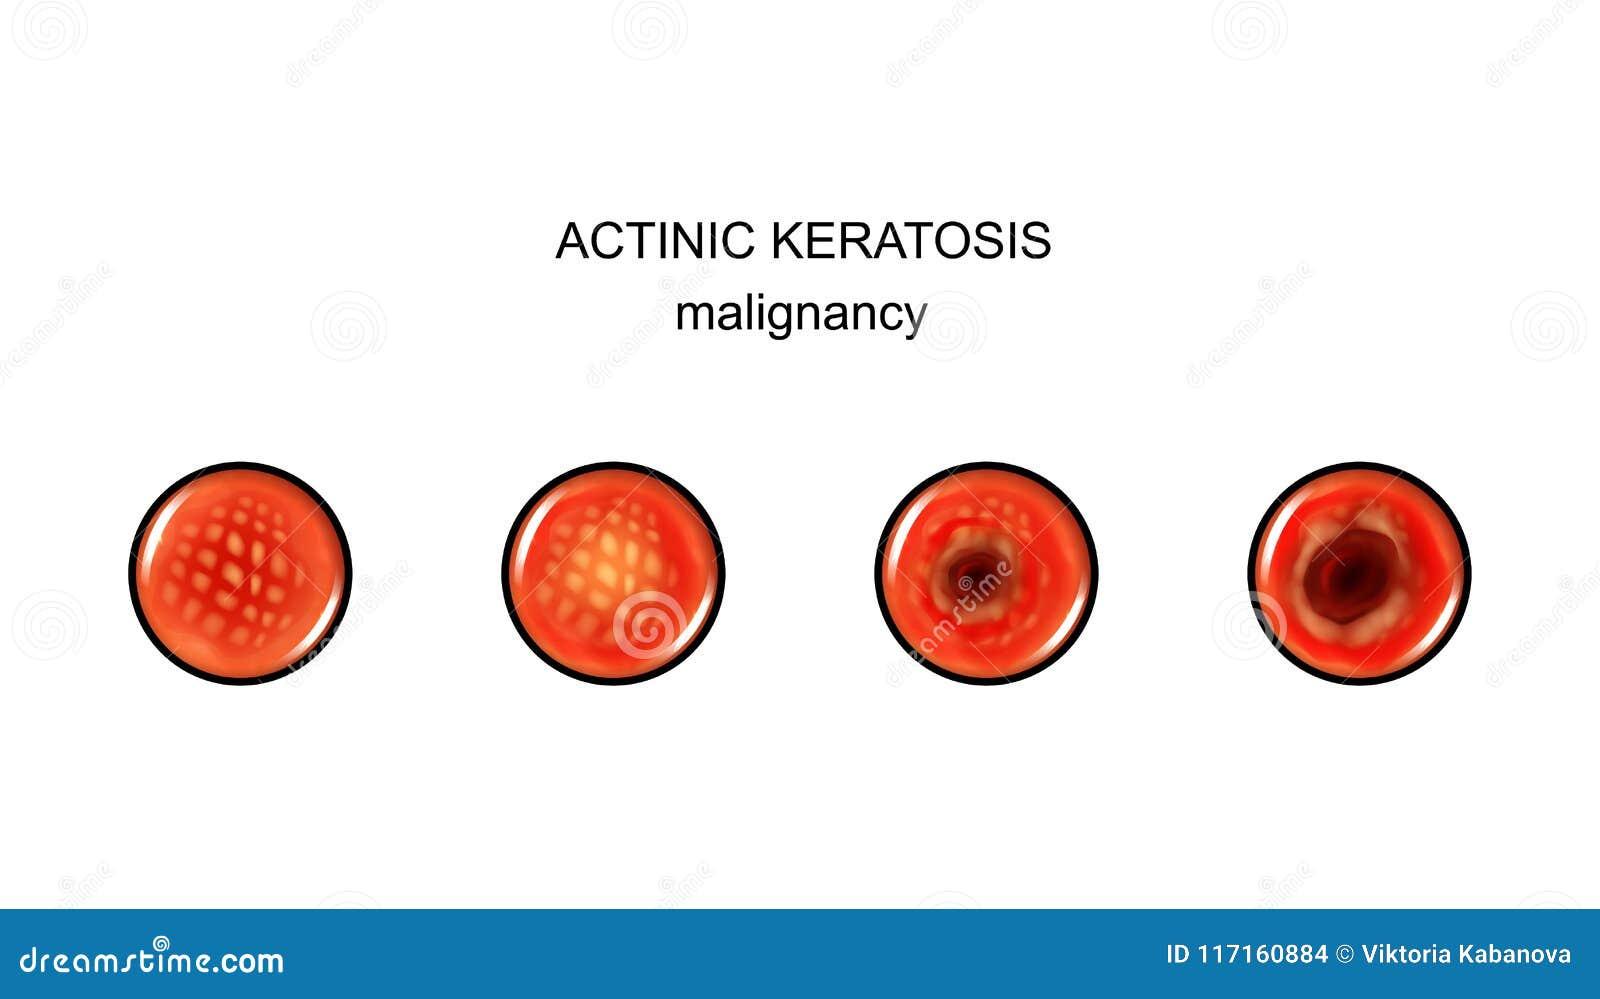 cancer cerebral imagenes human papillomavirus infection organism